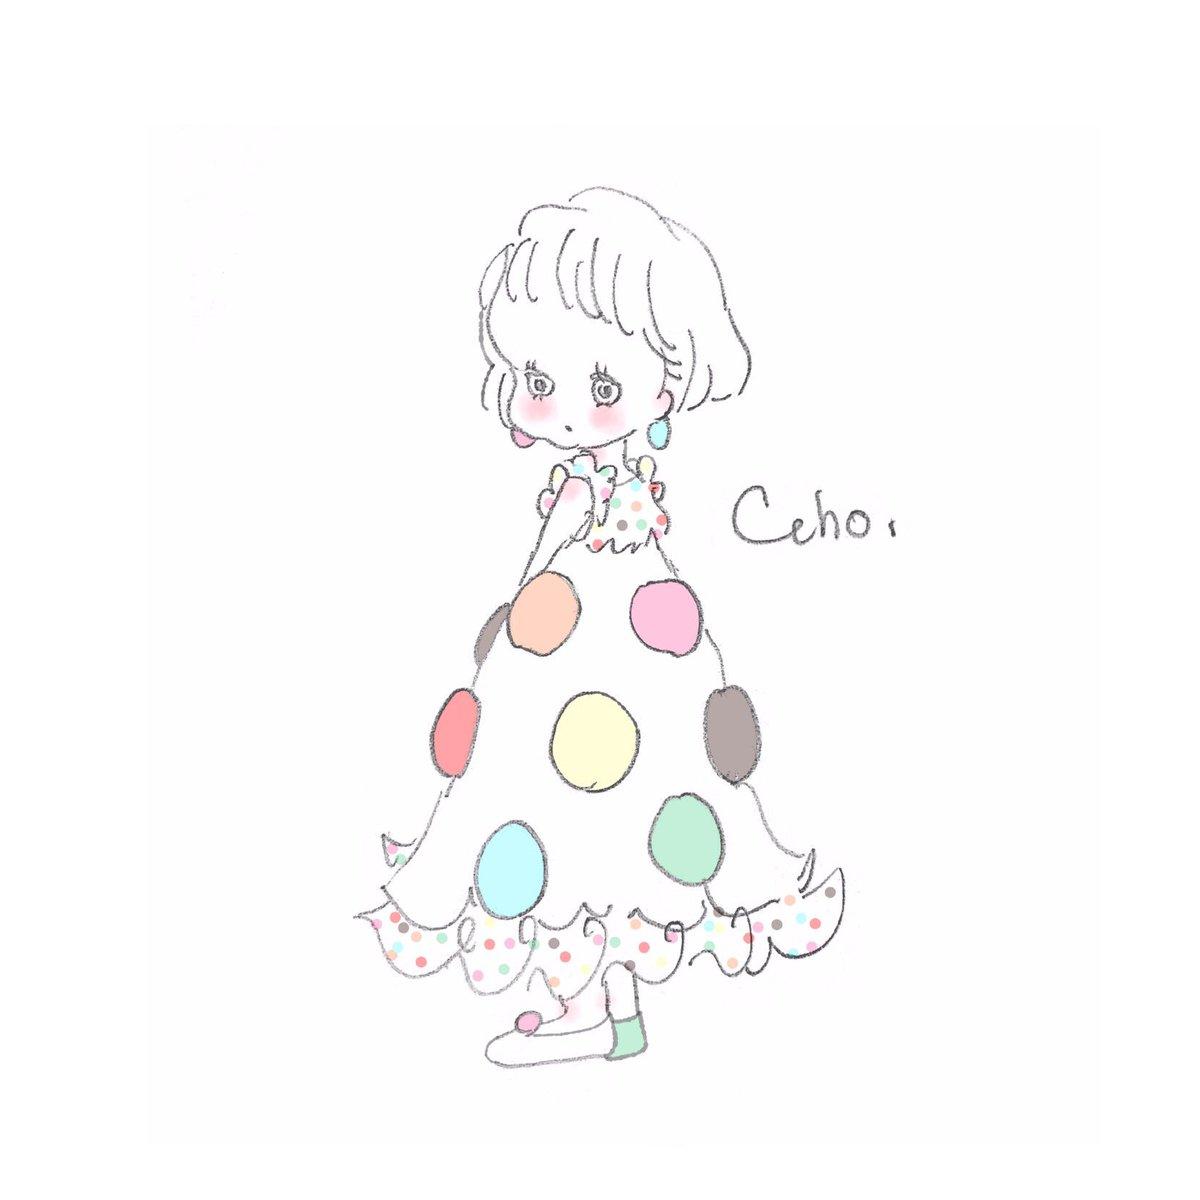 Caho お菓子コーデ わかるかな 可愛い 食べたいな